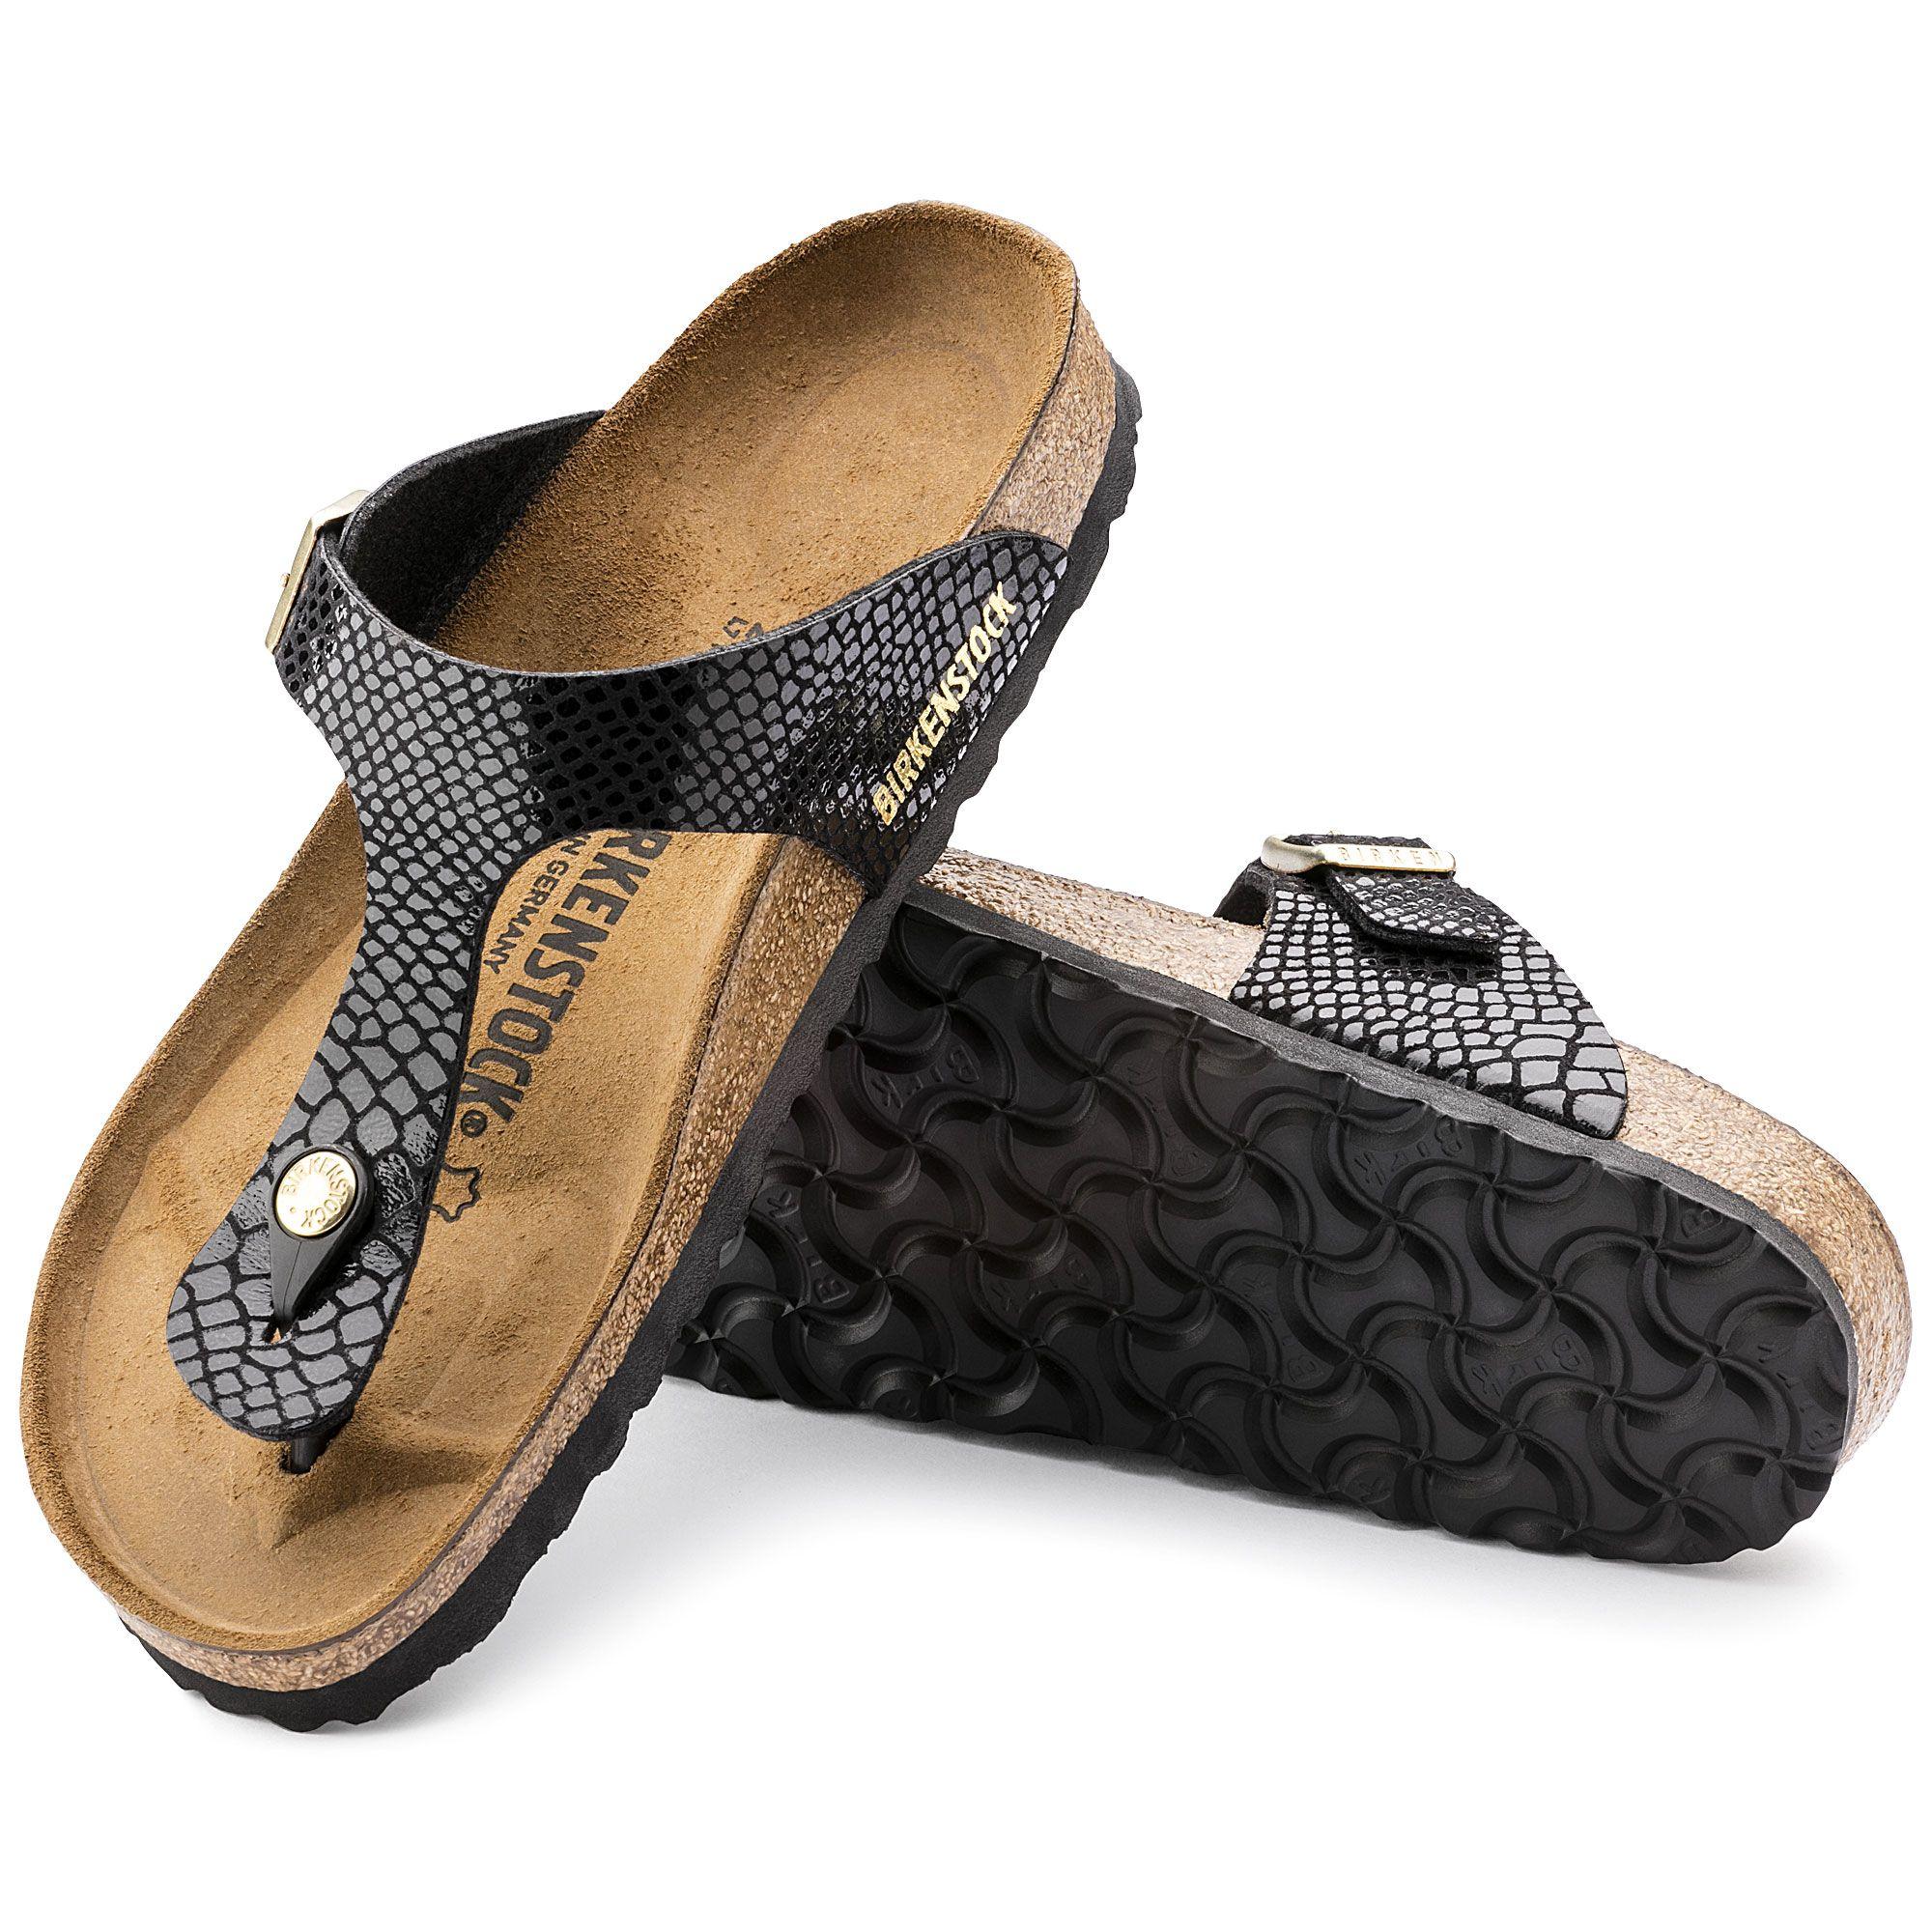 Gizeh Birko Flor Shiny Snake Black   Fashion, Shoes